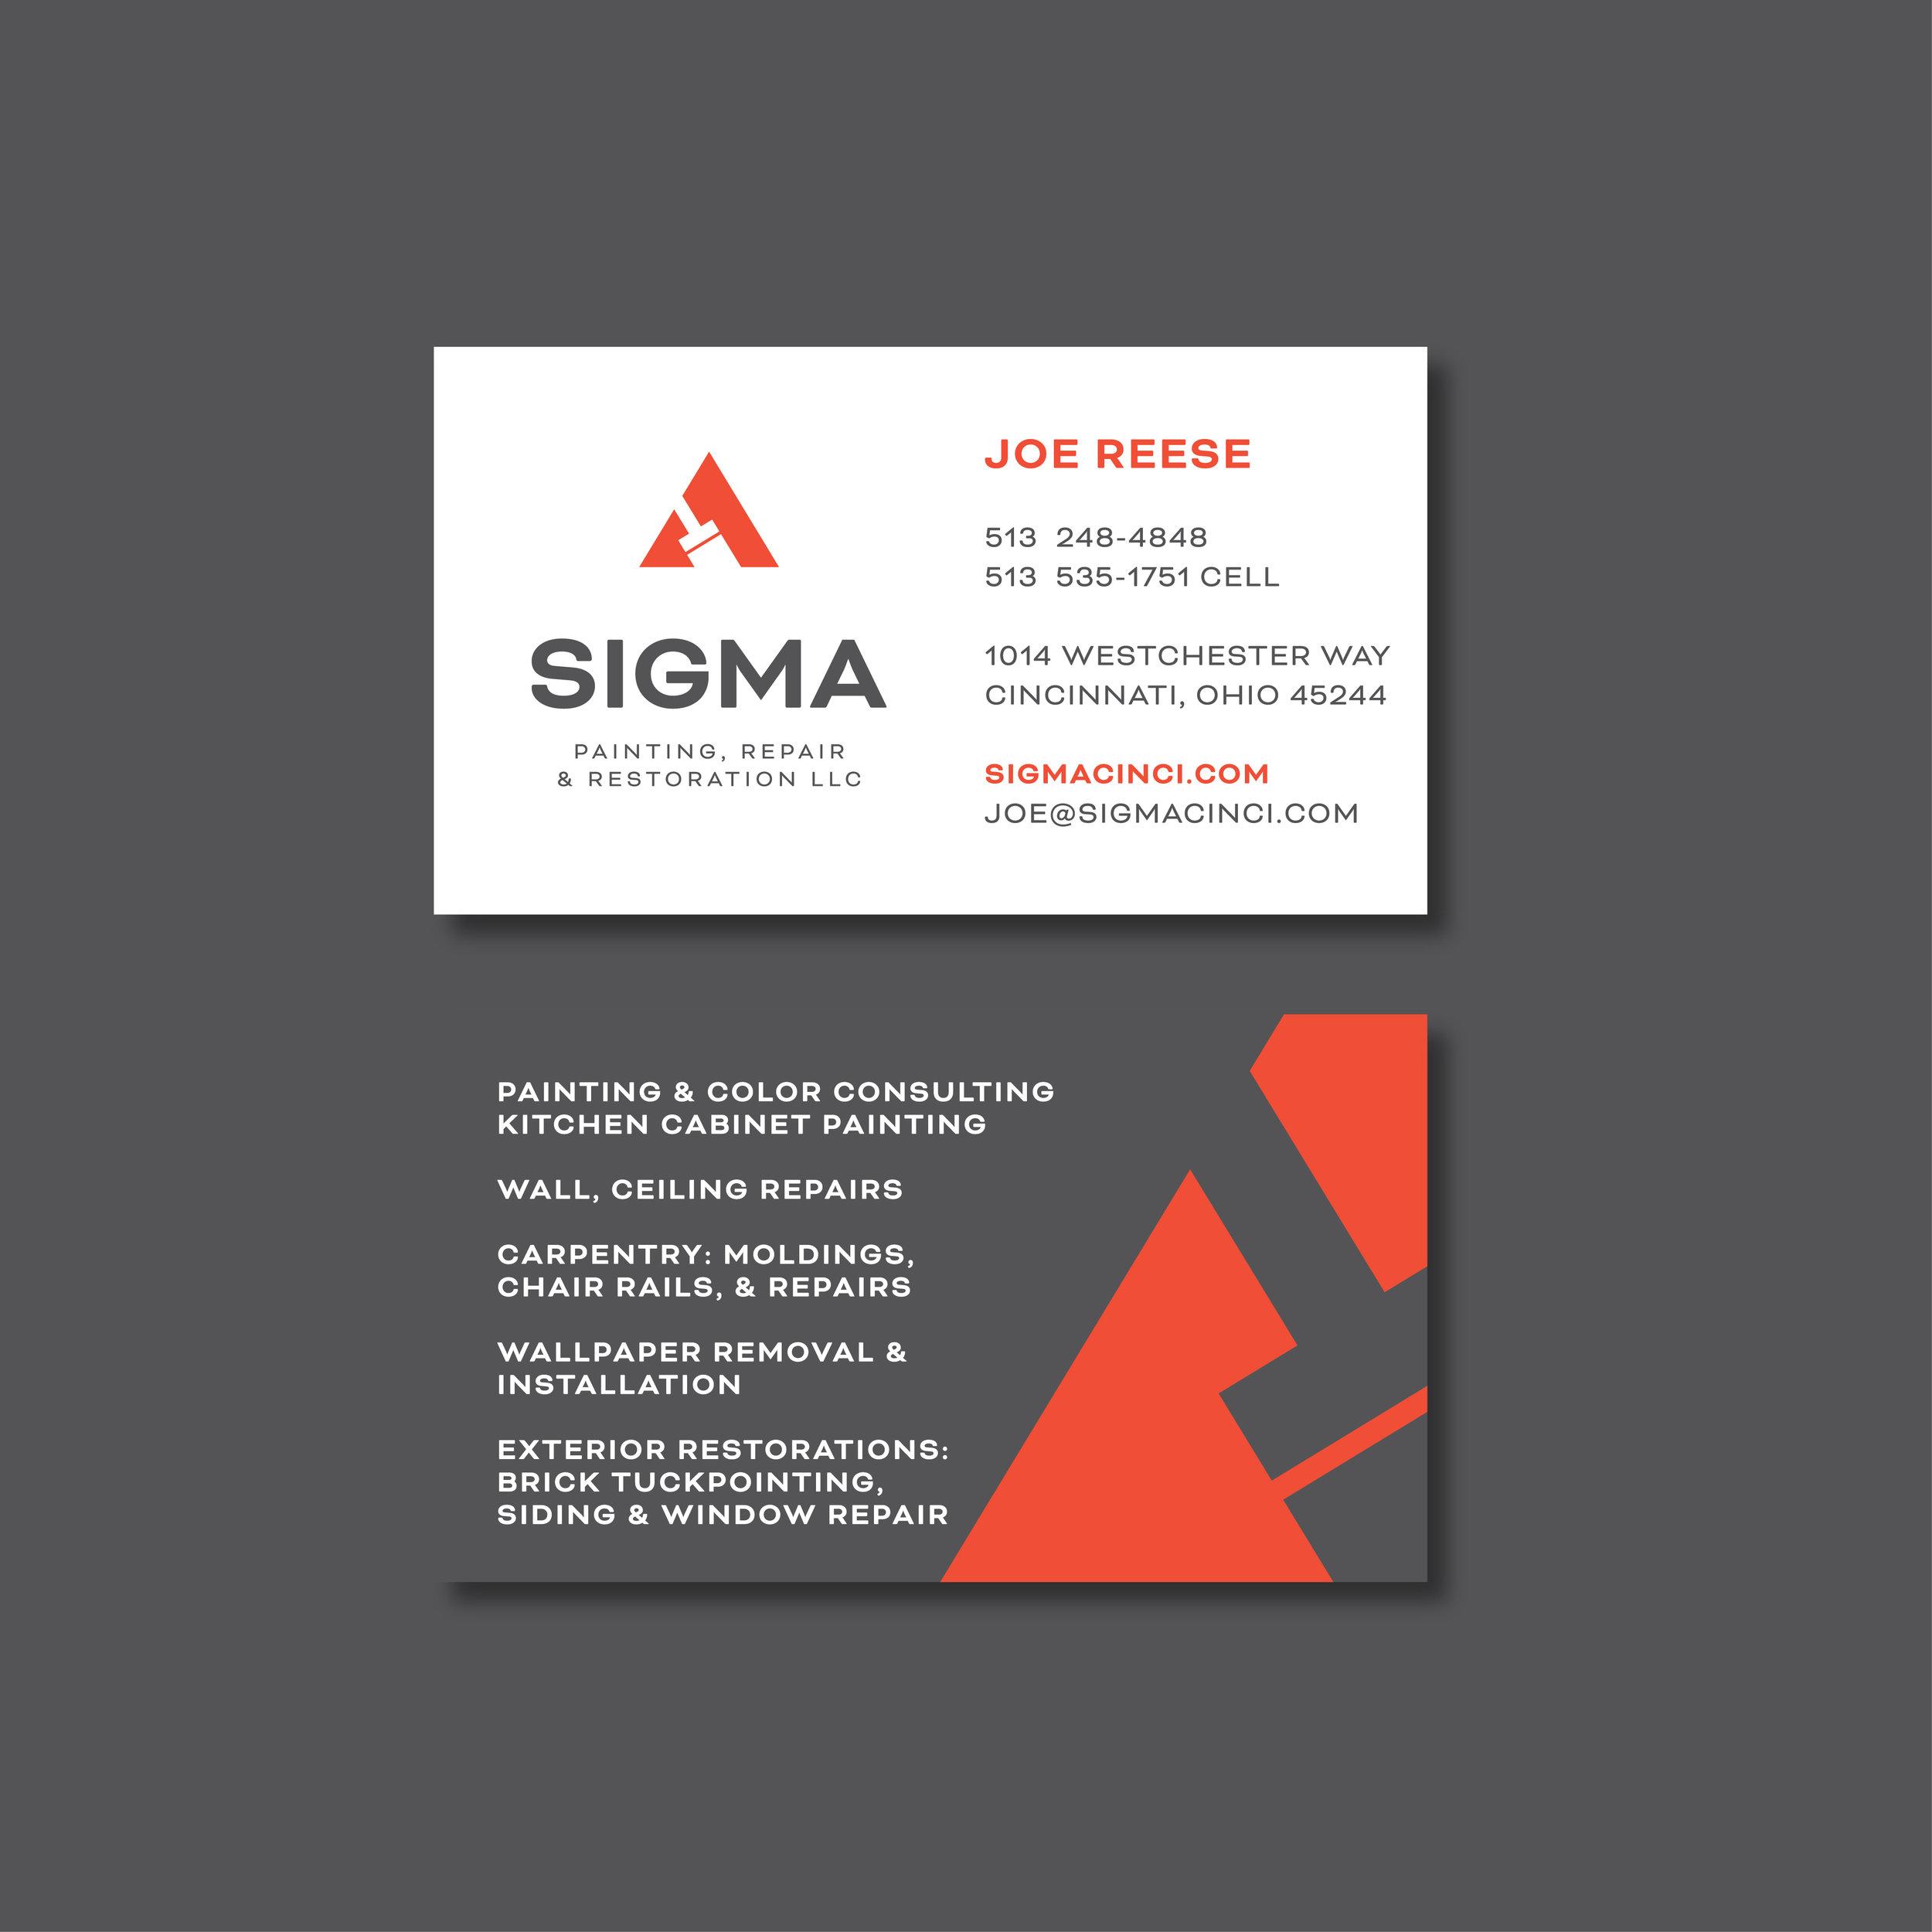 sigma business card.jpg